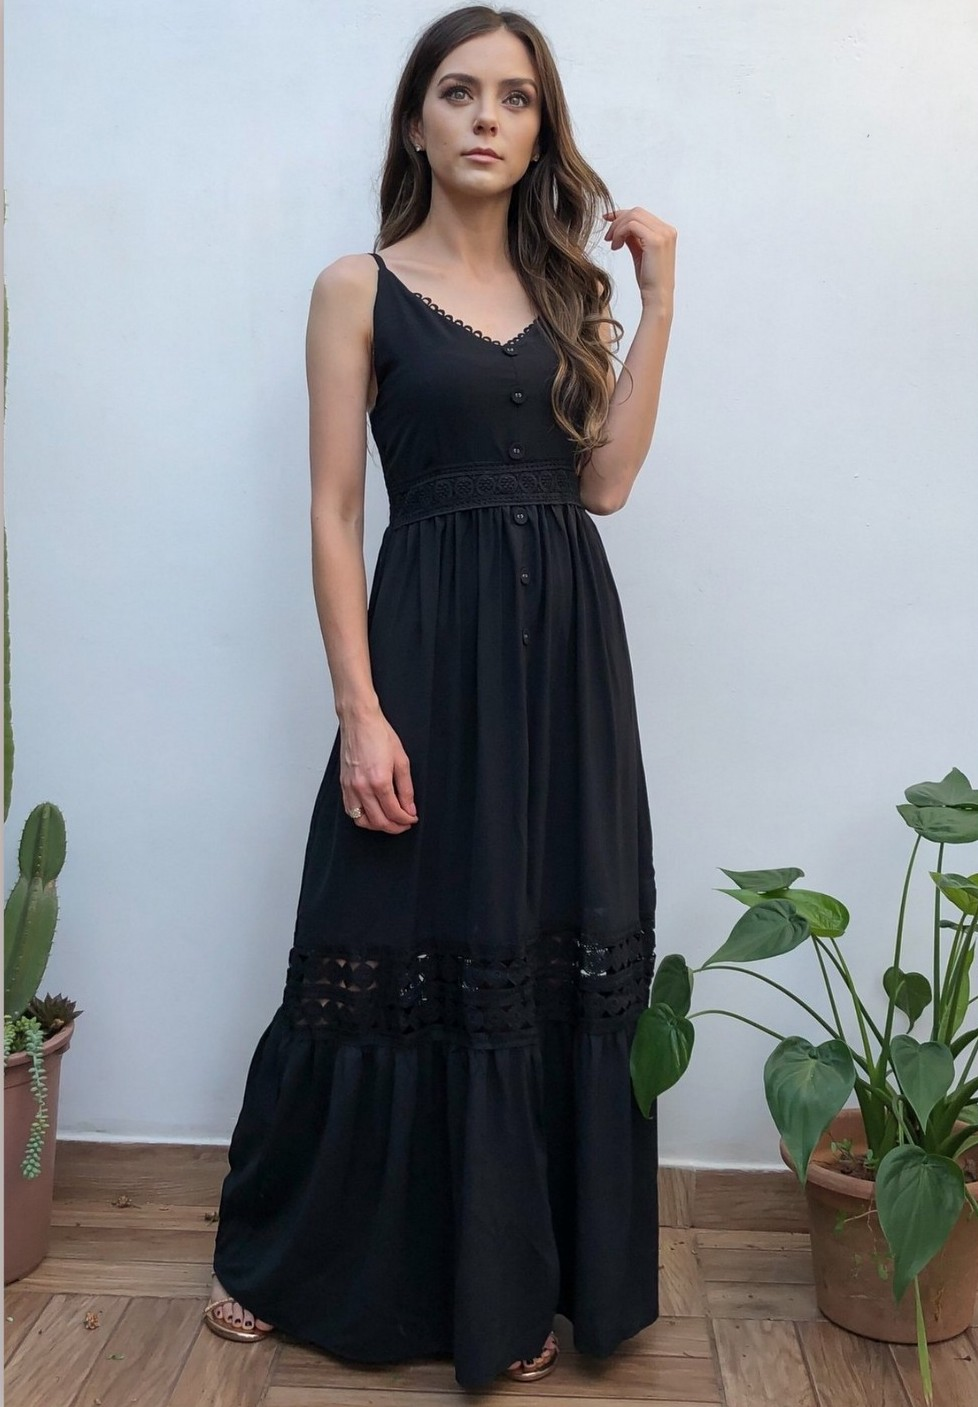 Vestido Longo Alças Rodado Preto